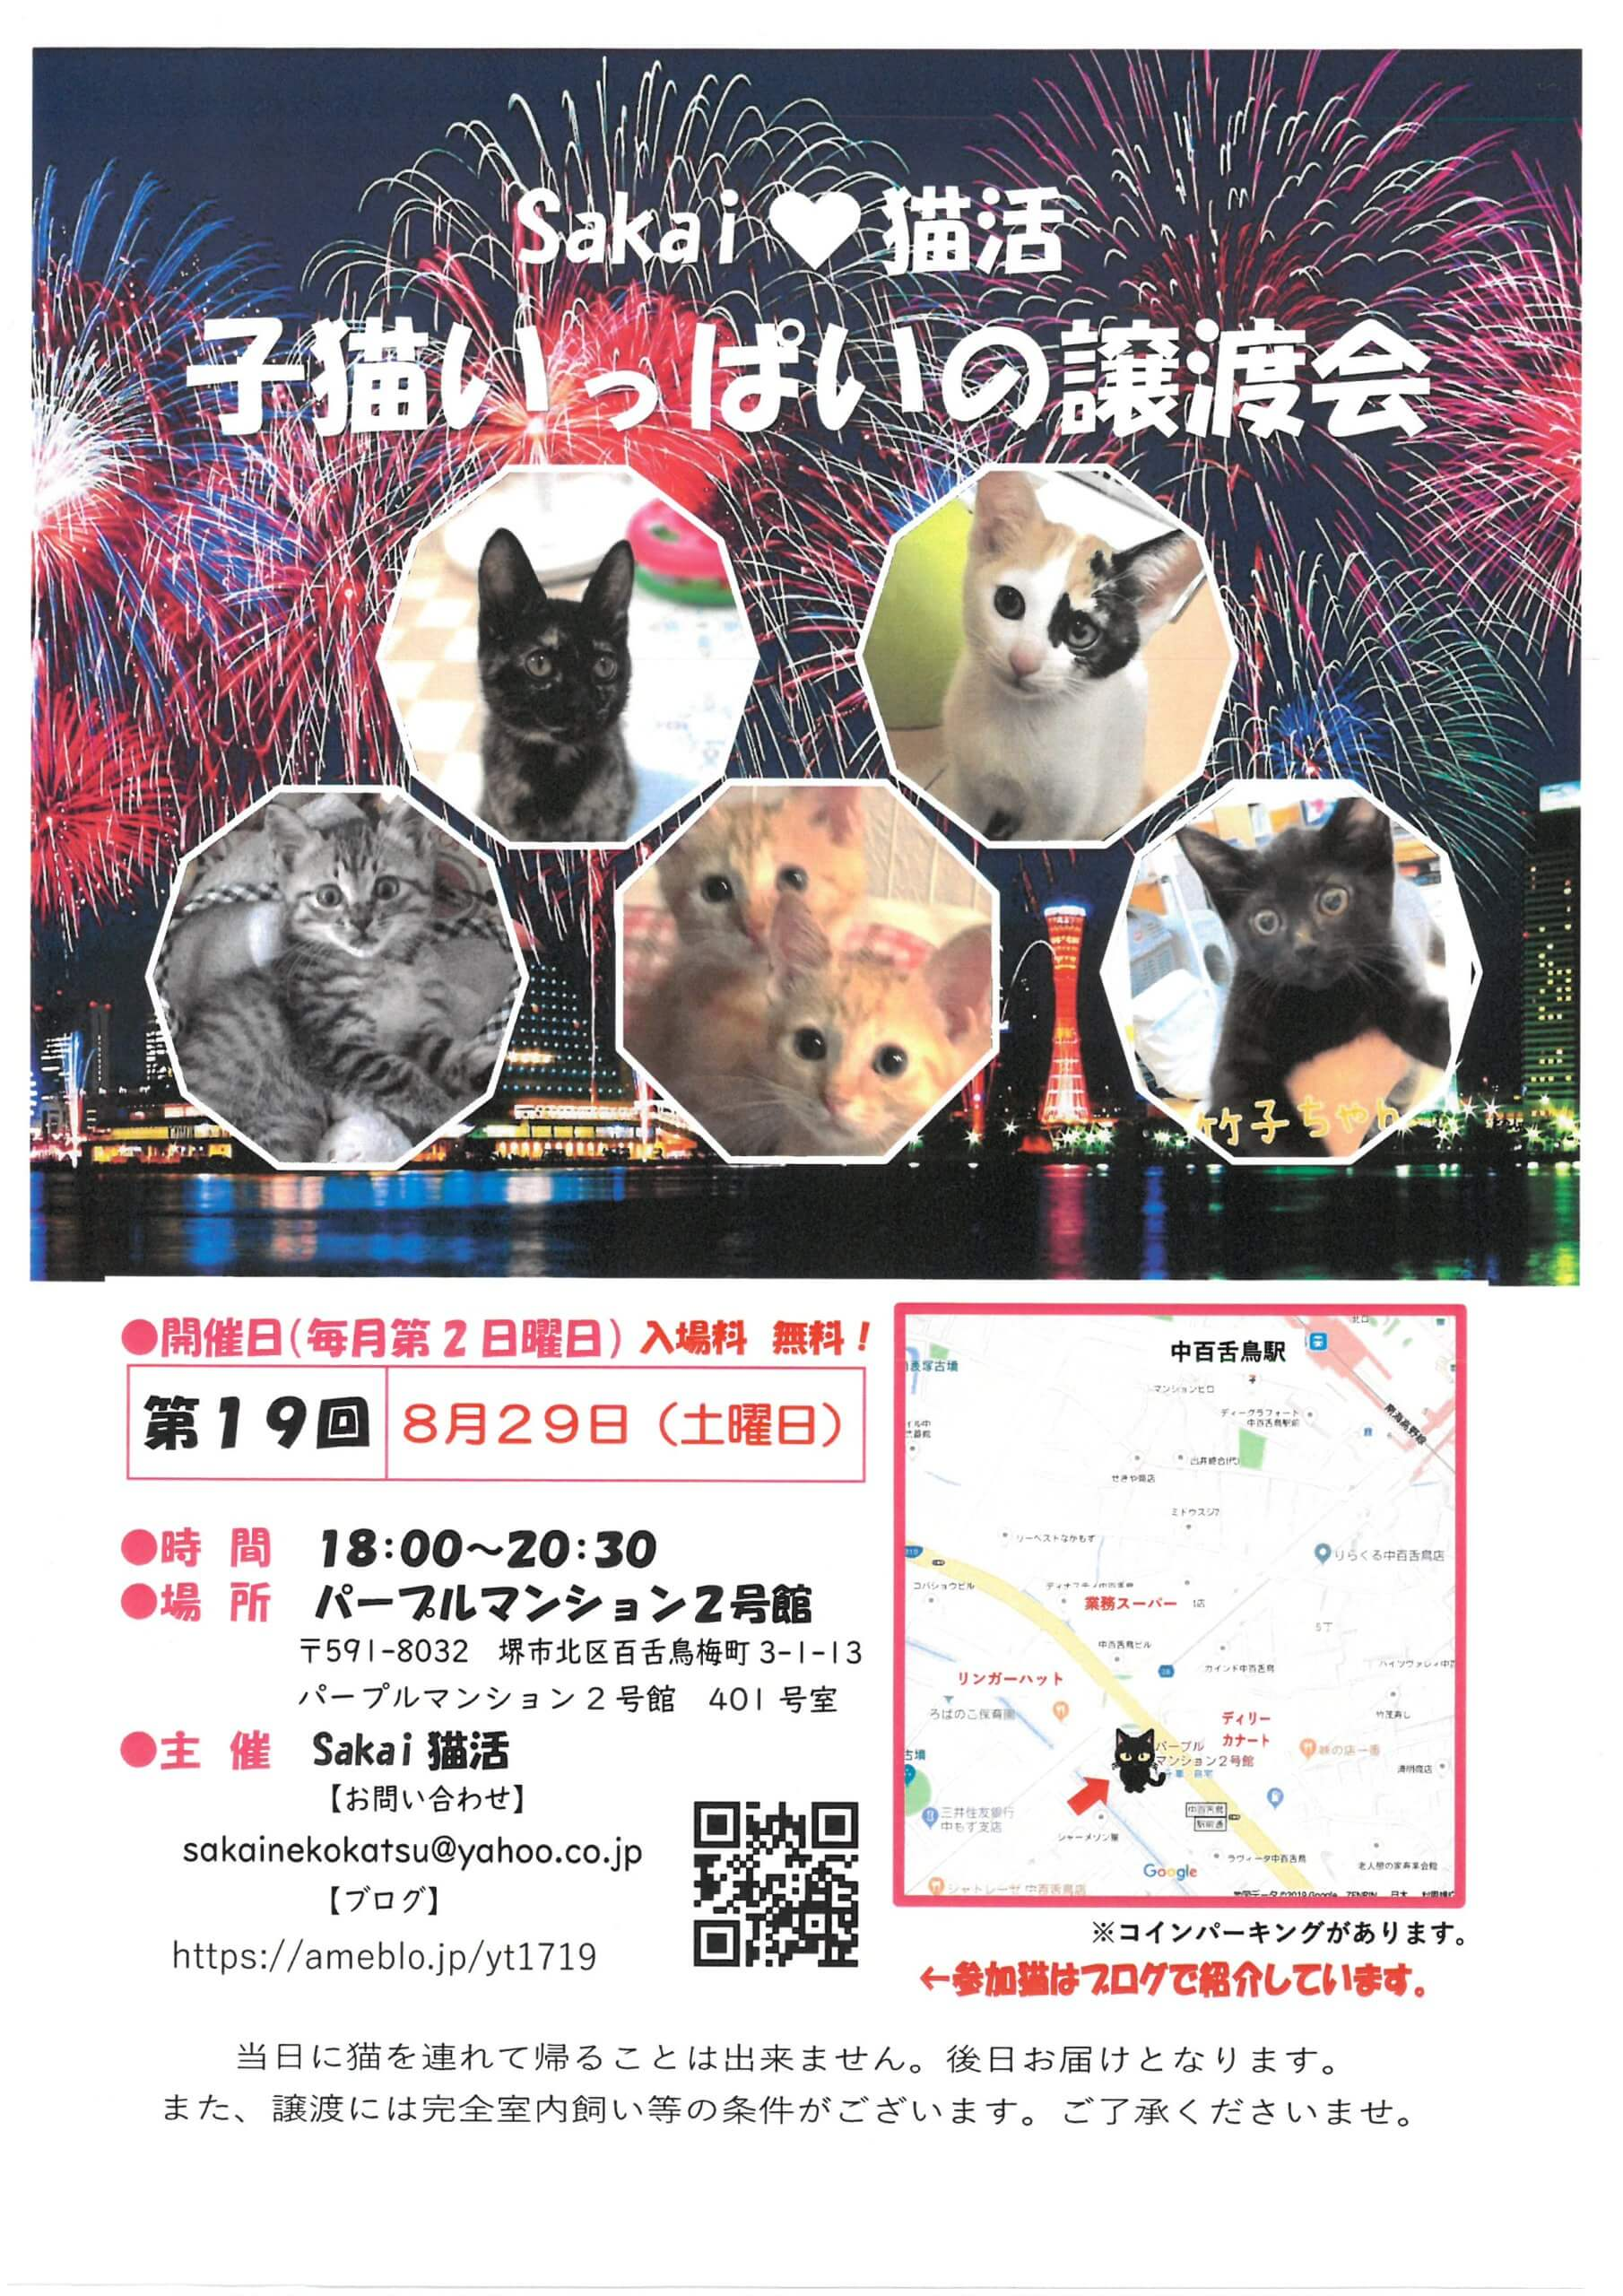 sakai猫活 子猫いっぱいの譲渡会